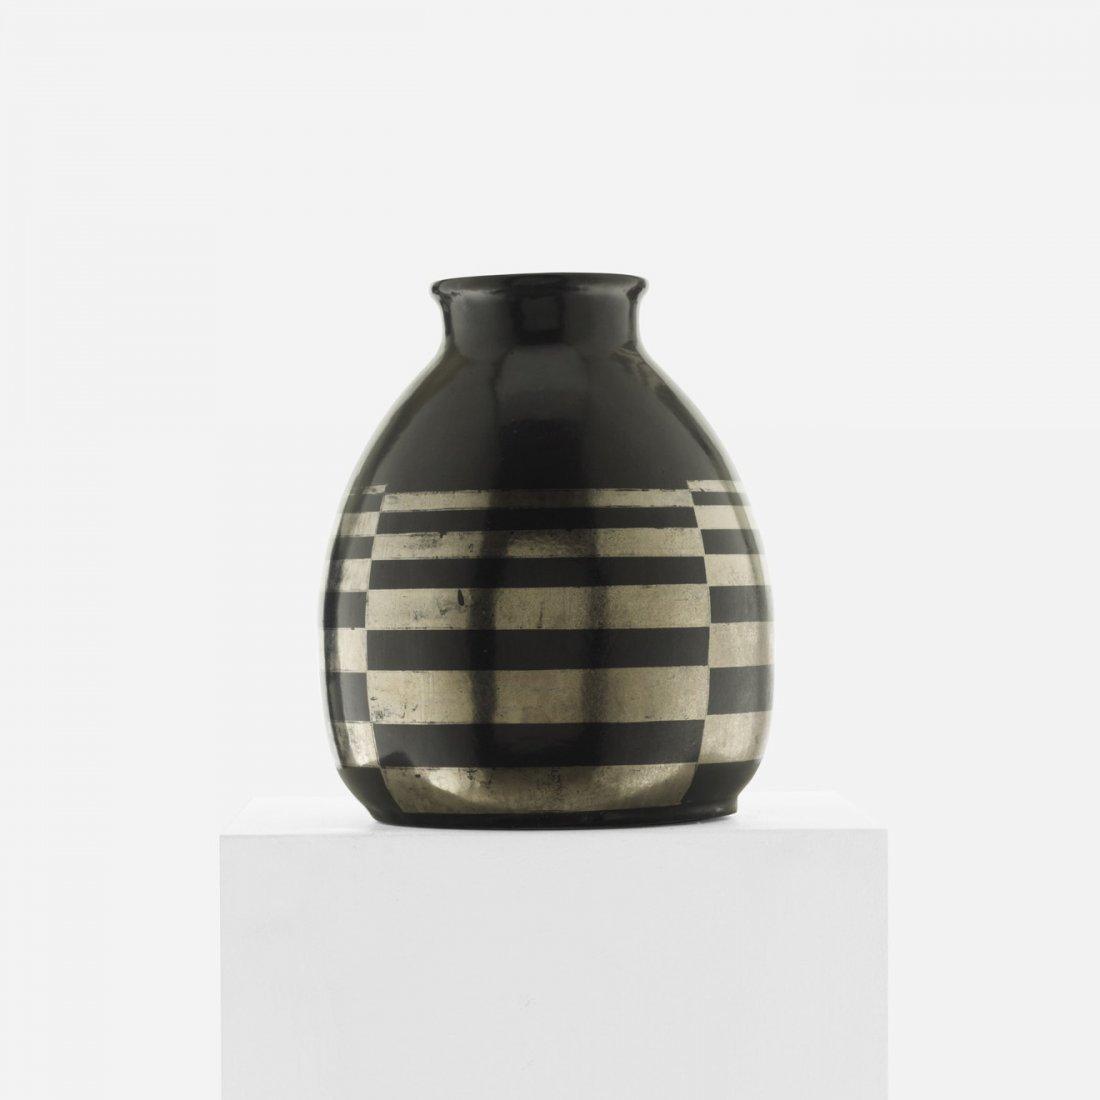 371: Jean Luce vase